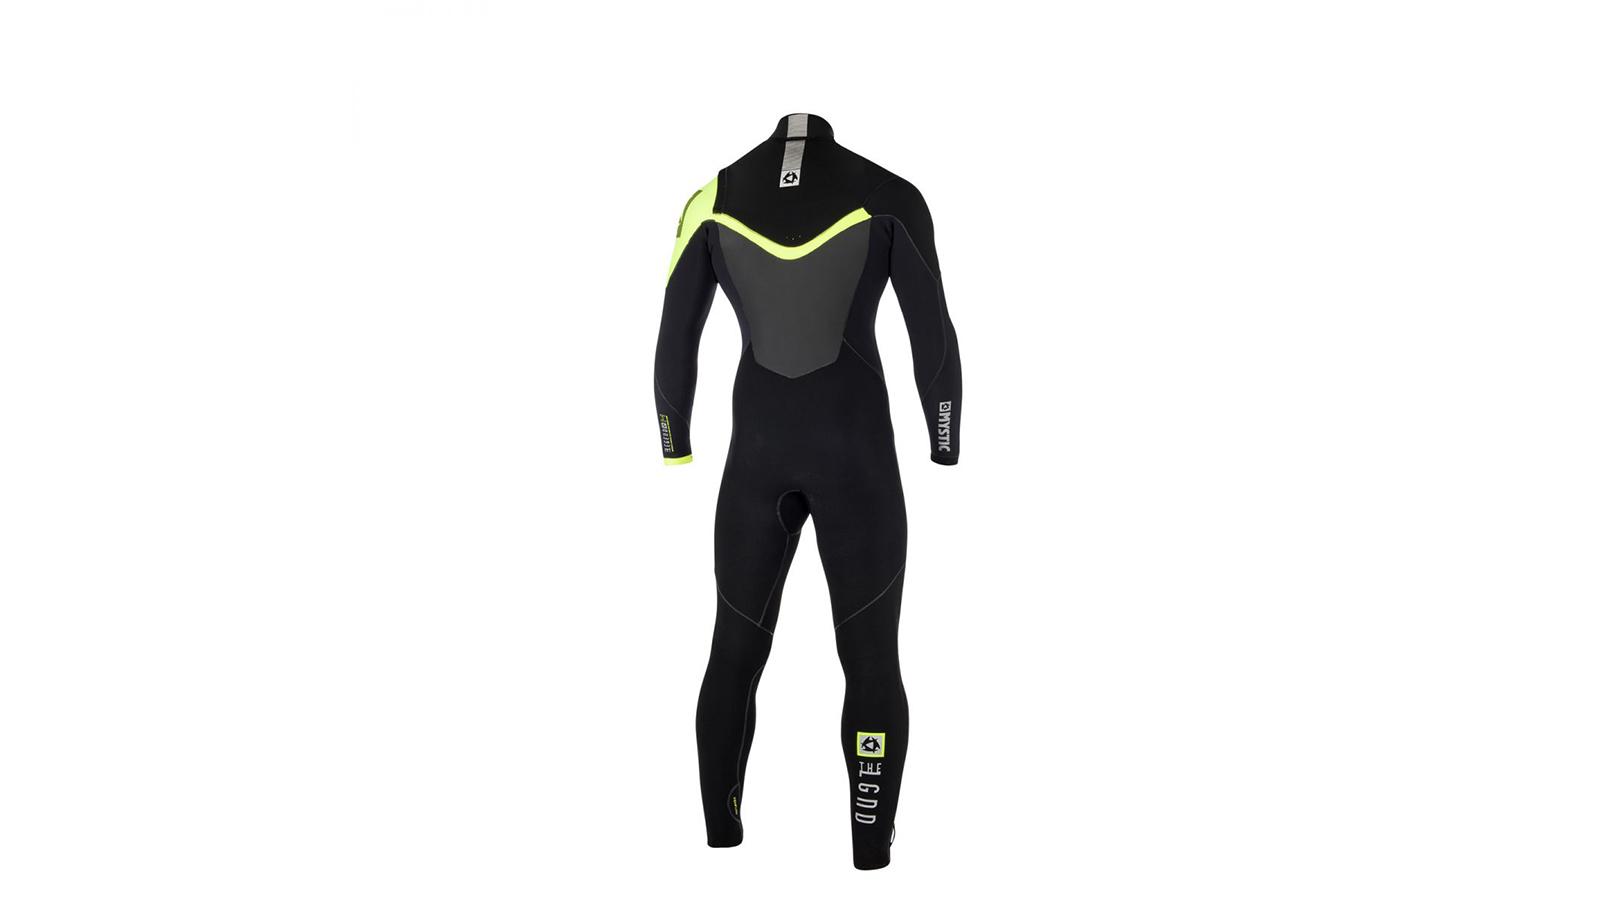 Wetsuit-Legend-53-fullsuit-fz-953-b-1819